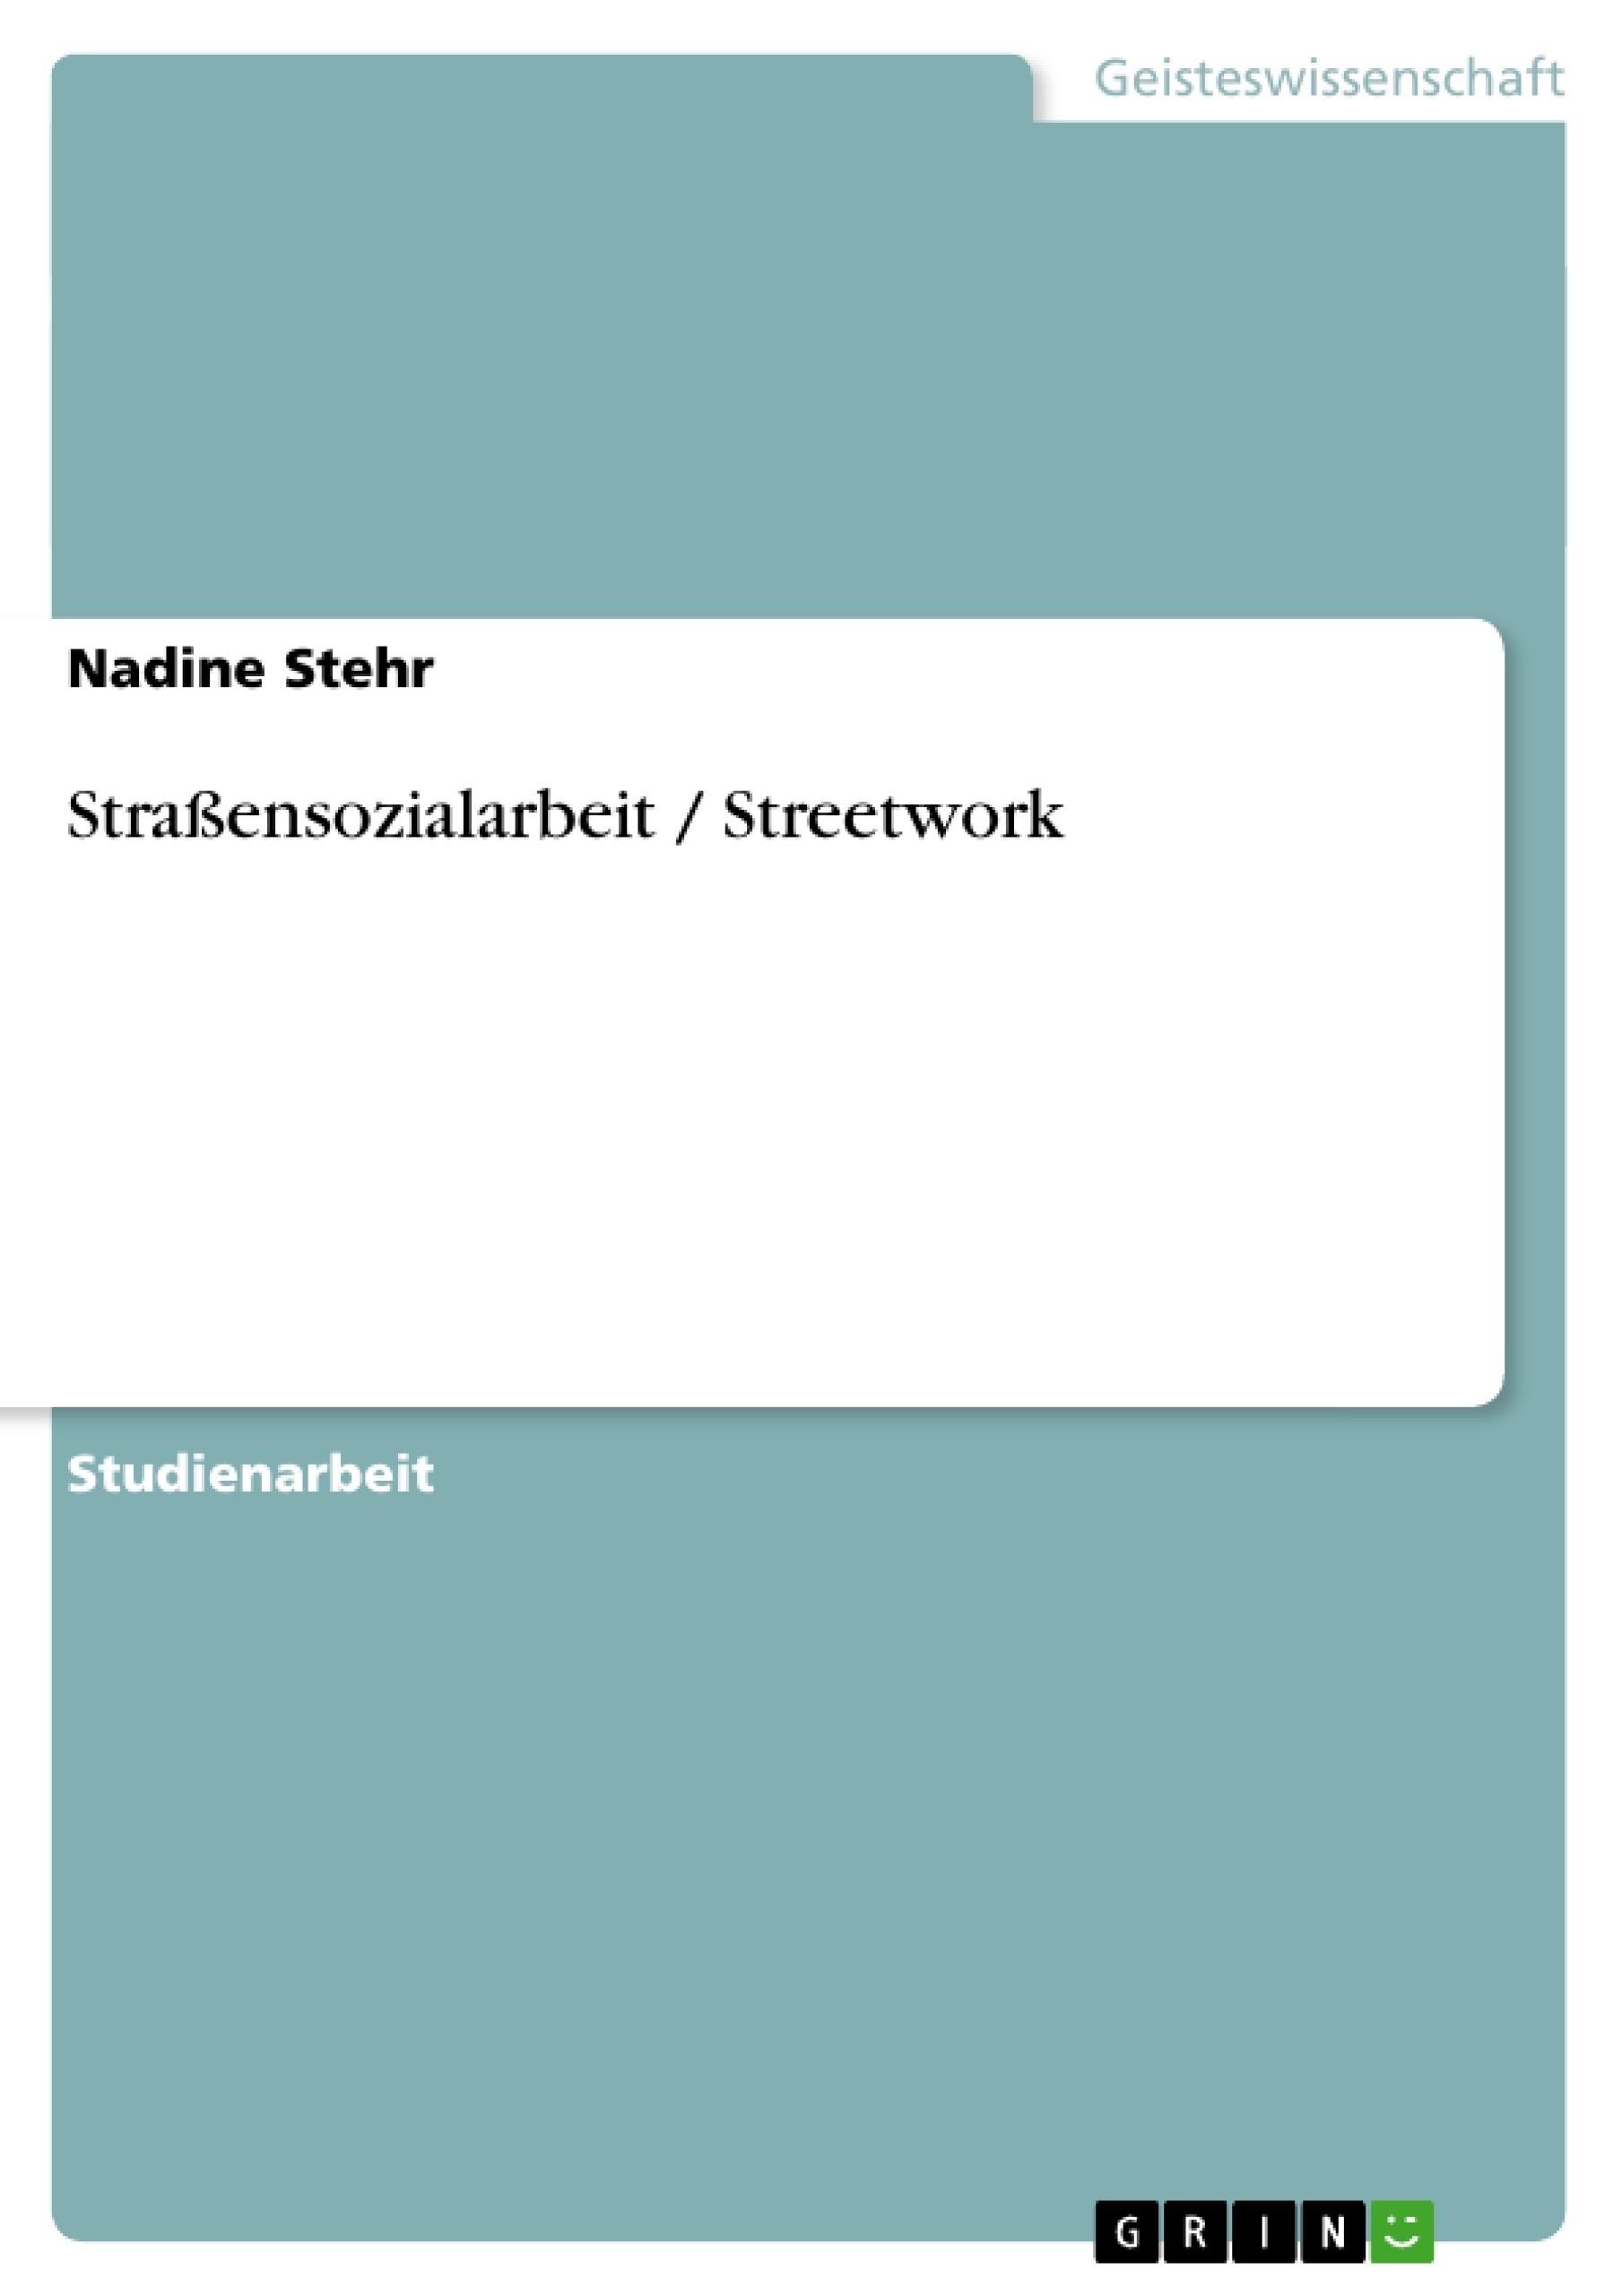 Titel: Straßensozialarbeit / Streetwork